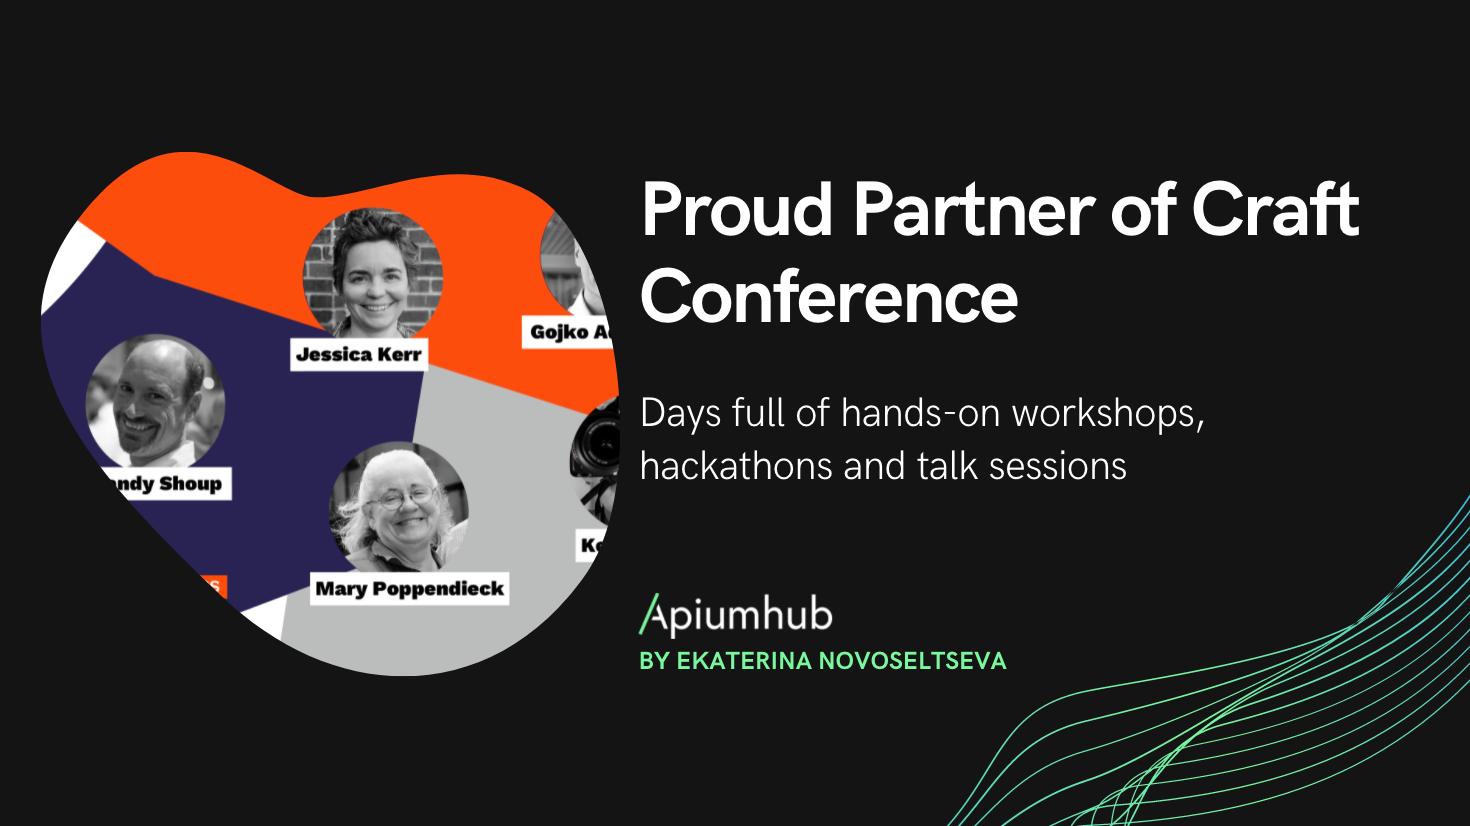 Apiumhub - proud partner of Craft Conference